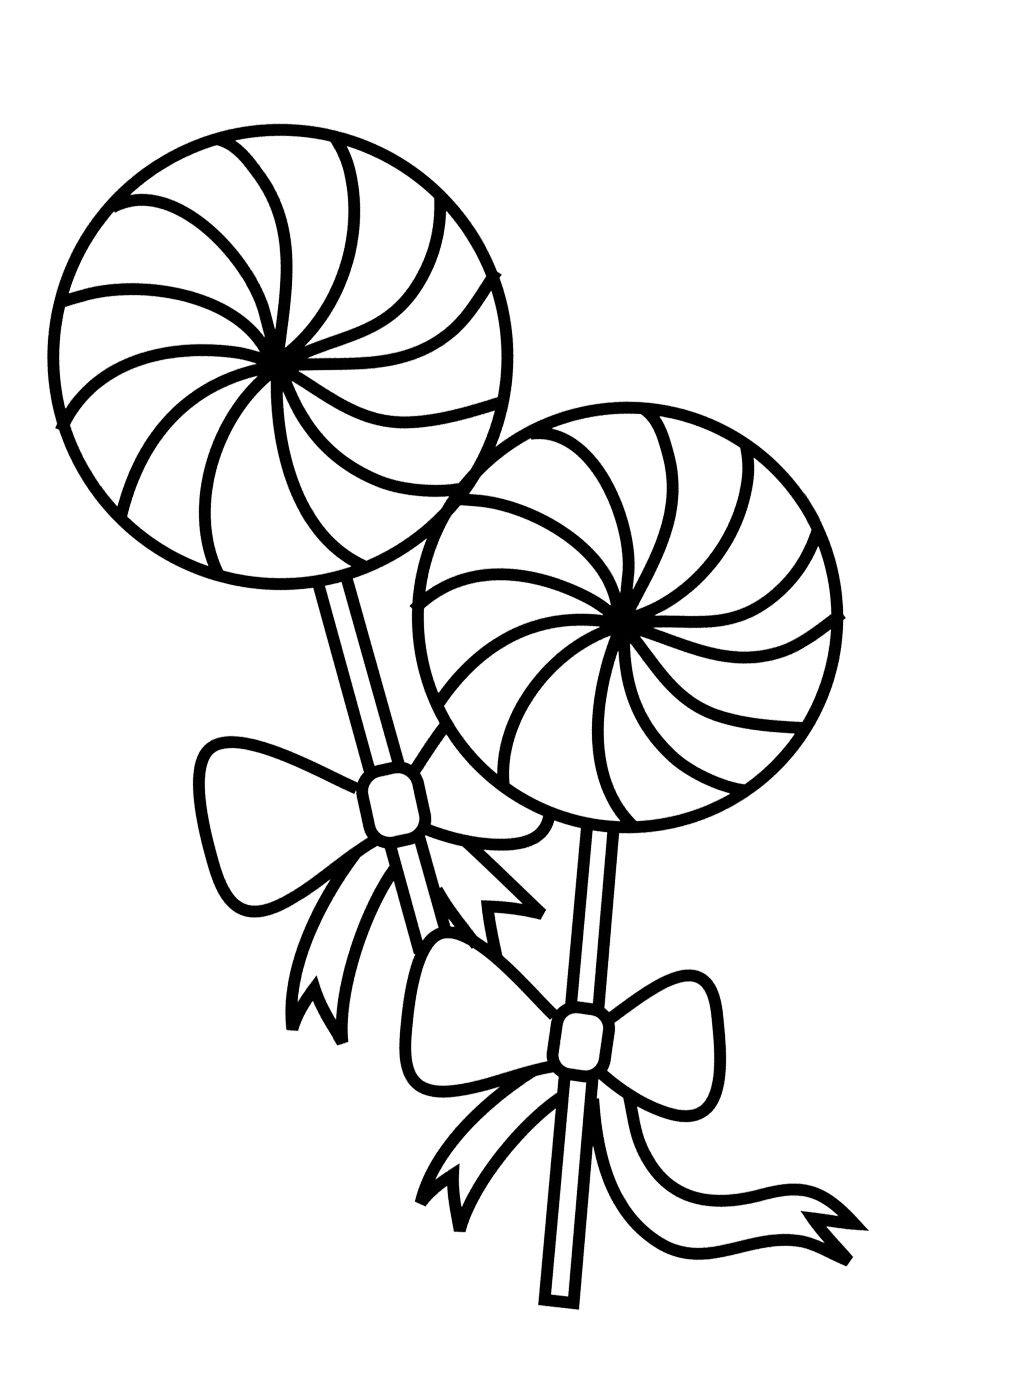 1024x1380 Two Lollipop Coloring Page Coloring Pages Para El